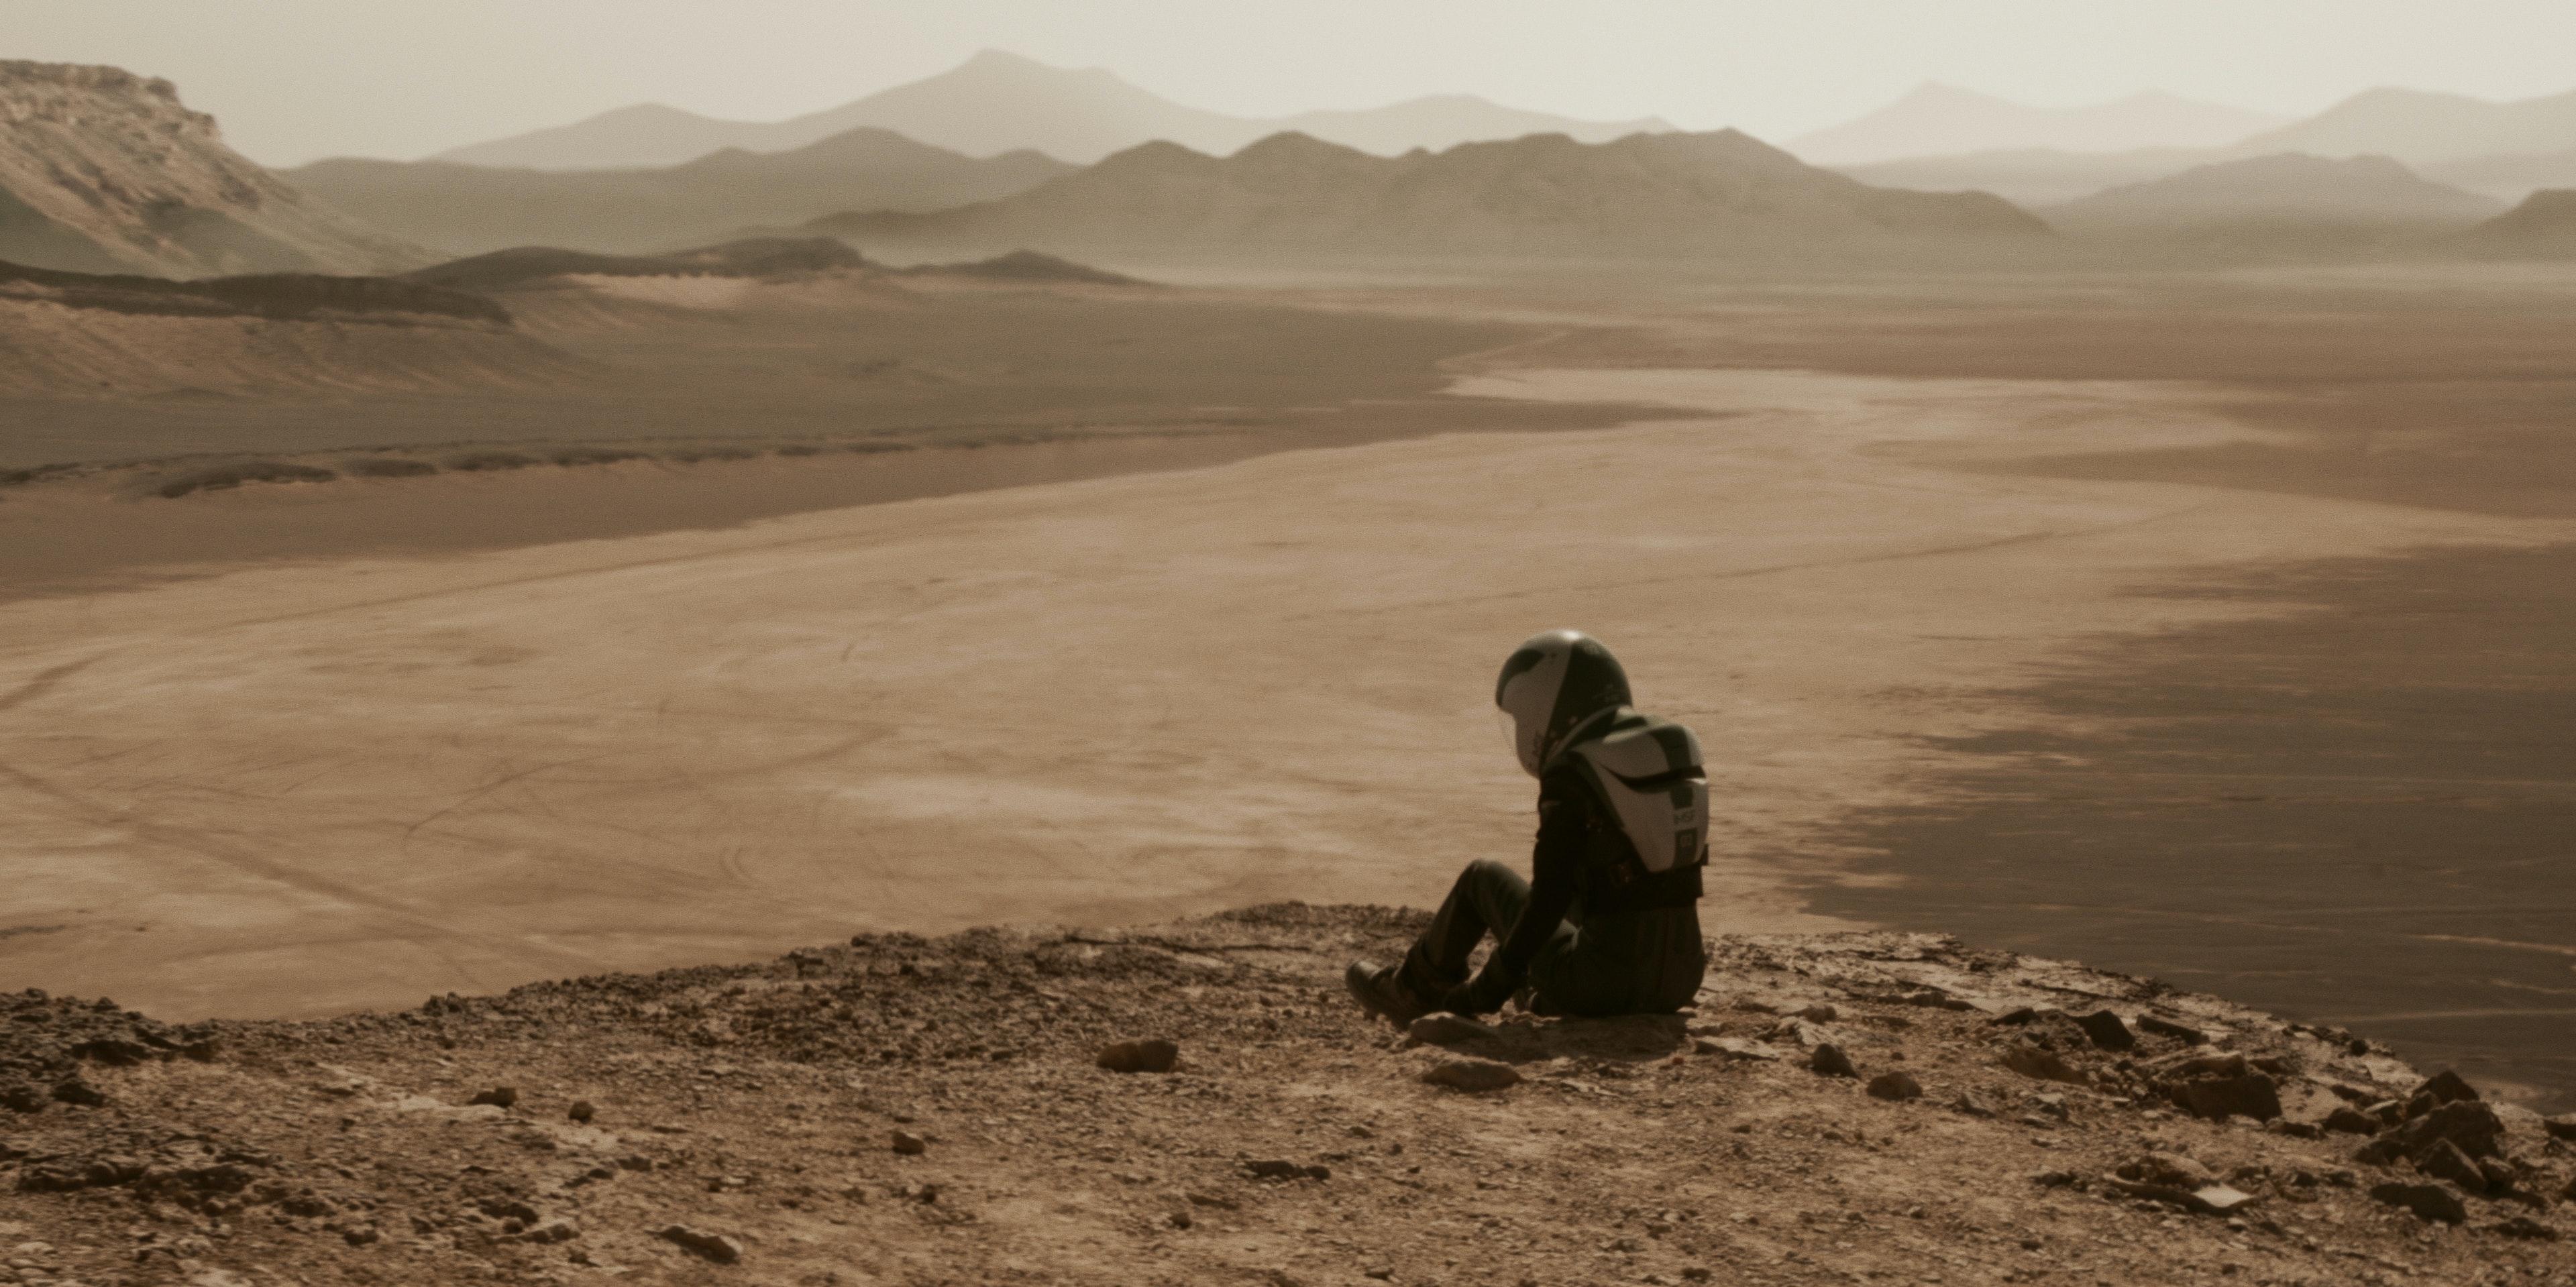 In Light of Insight Lander Success, Nat Geo's 'Mars' Offers Bleak Alternative